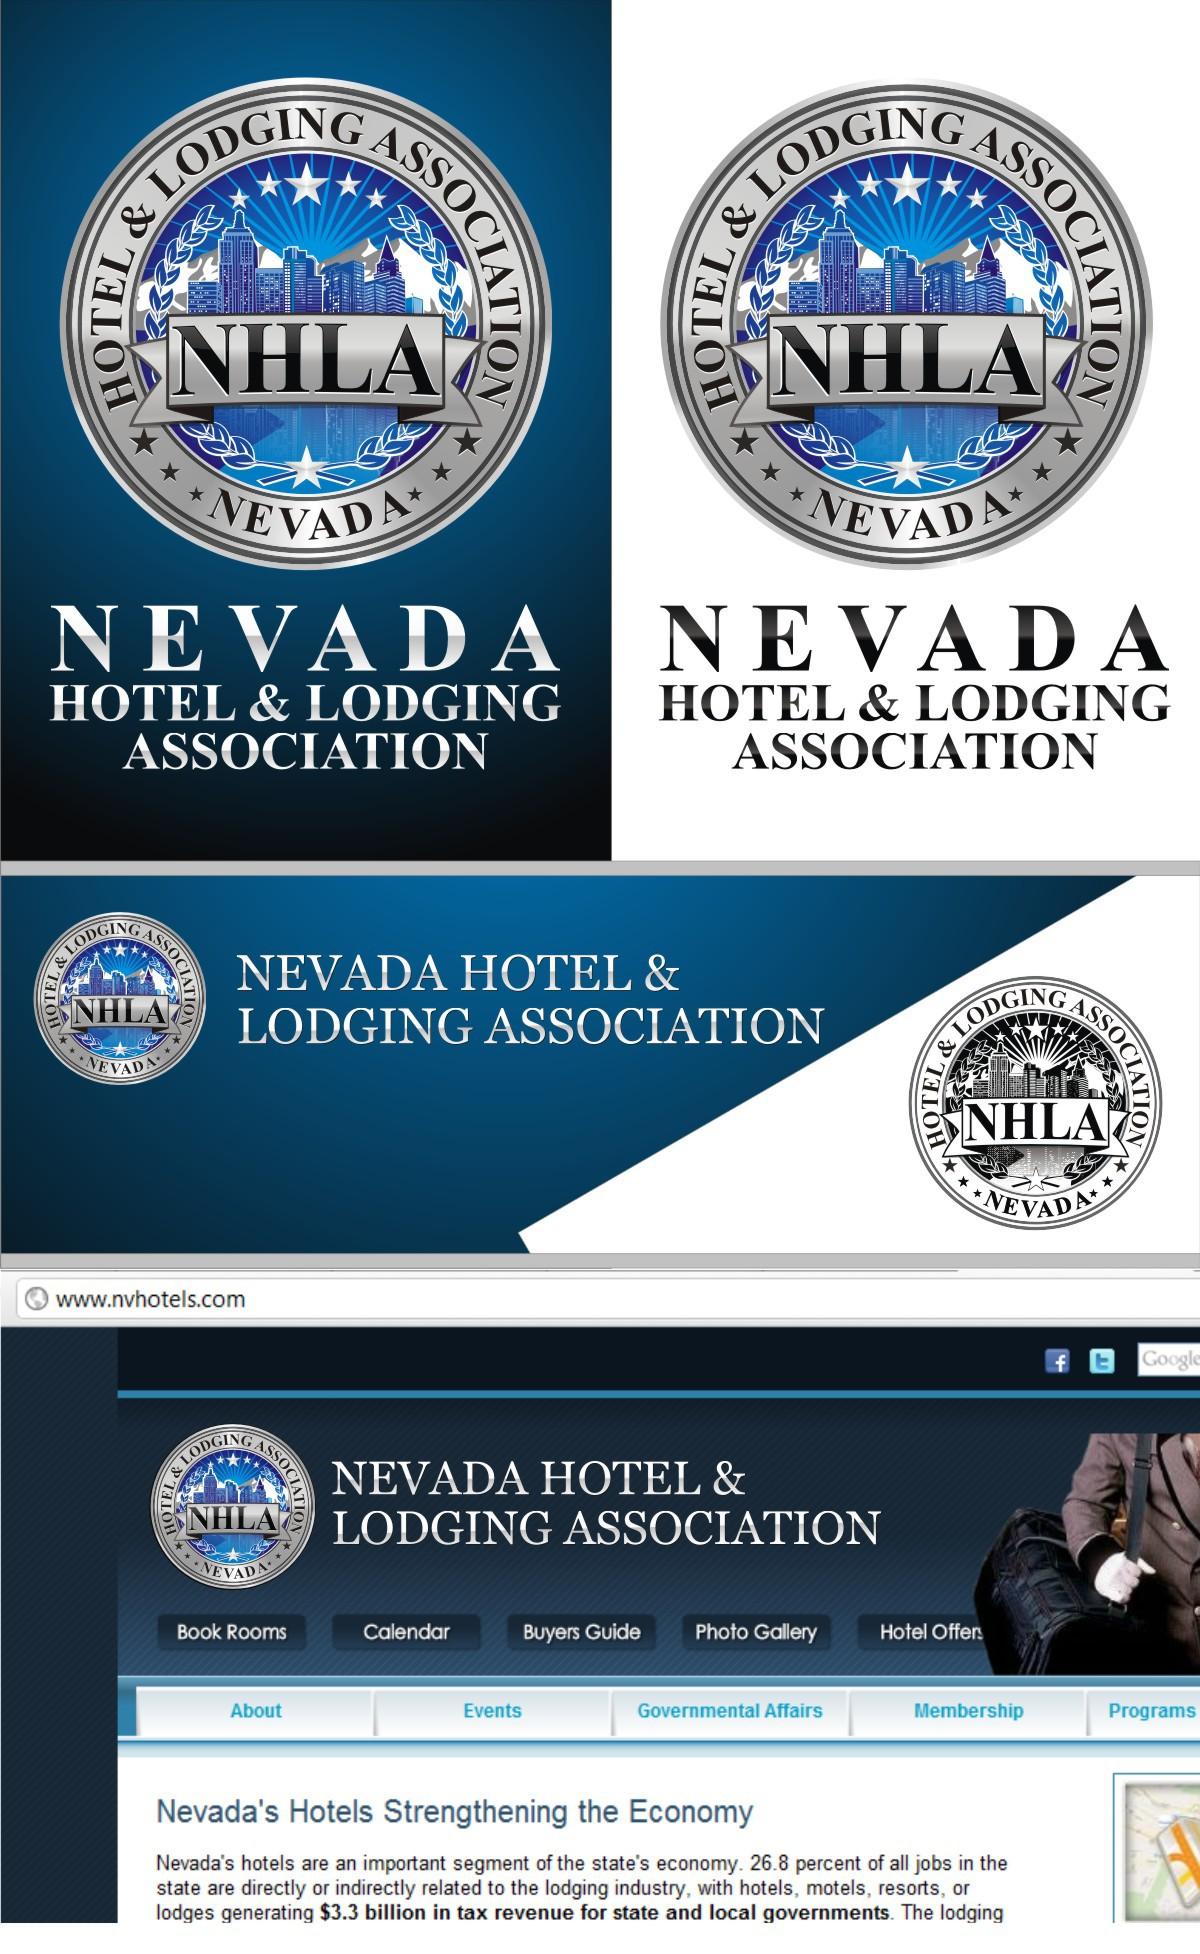 logo for Nevada Hotel & Lodging Association (NHLA)